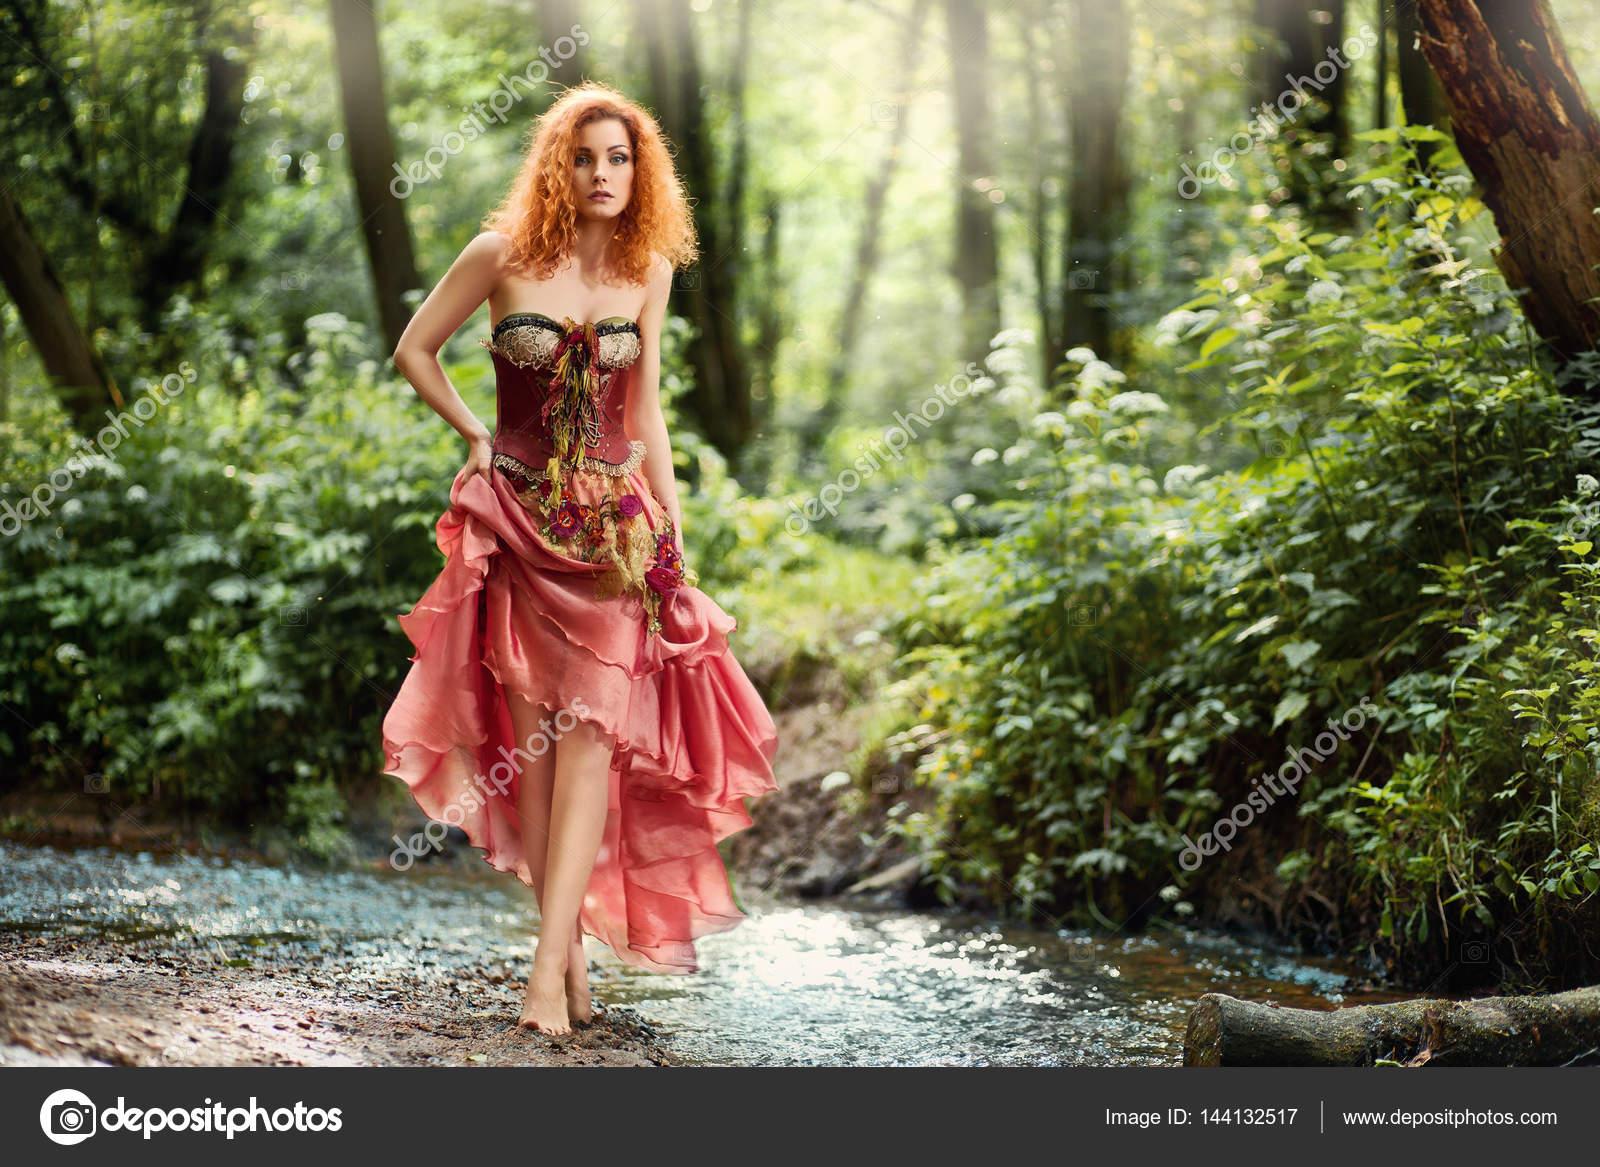 https://st3.depositphotos.com/1001478/14413/i/1600/depositphotos_144132517-stock-photo-beautiful-girl-in-red-dress.jpg